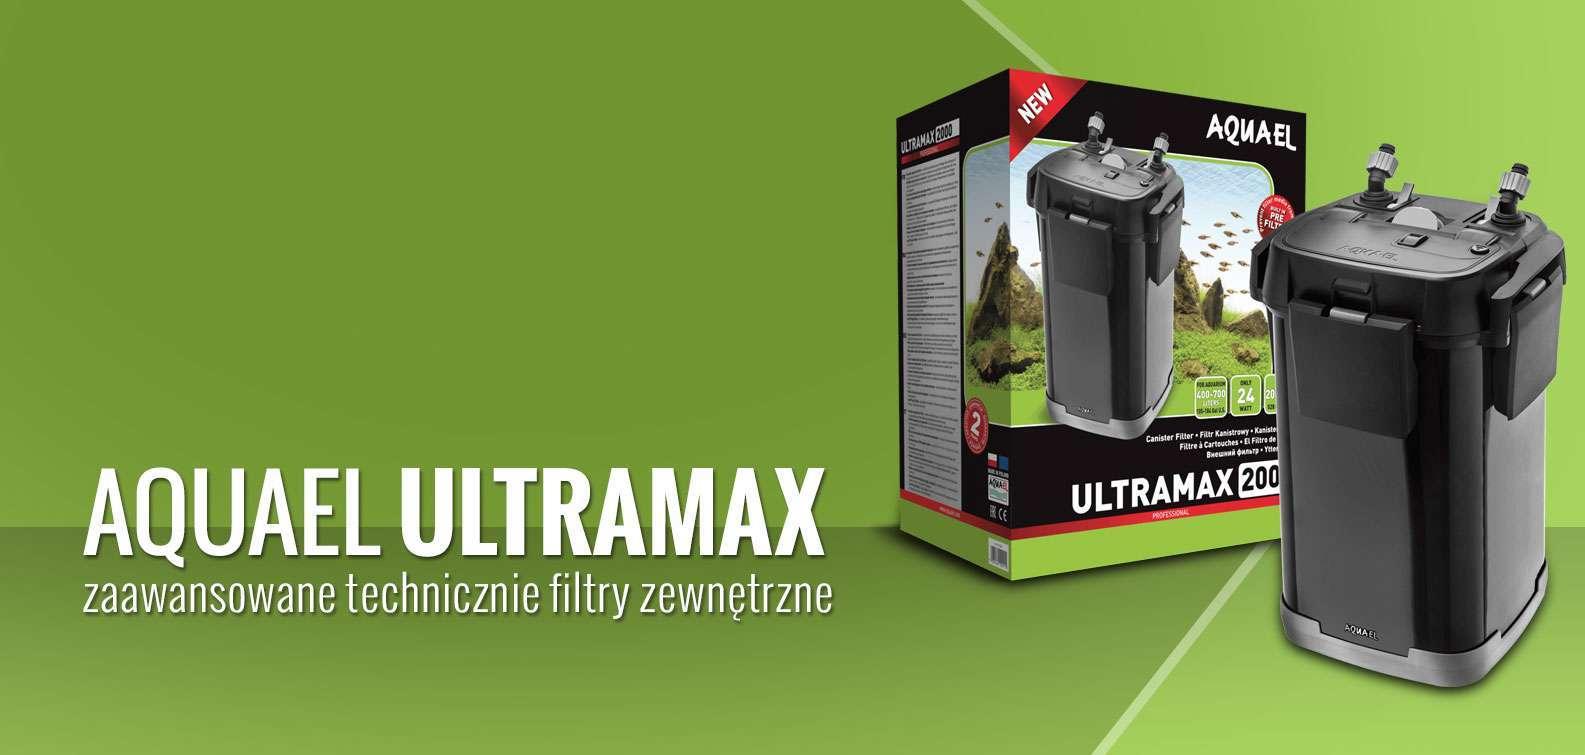 Aquael Ultramax - Zewnętrzny filtr akwariowy